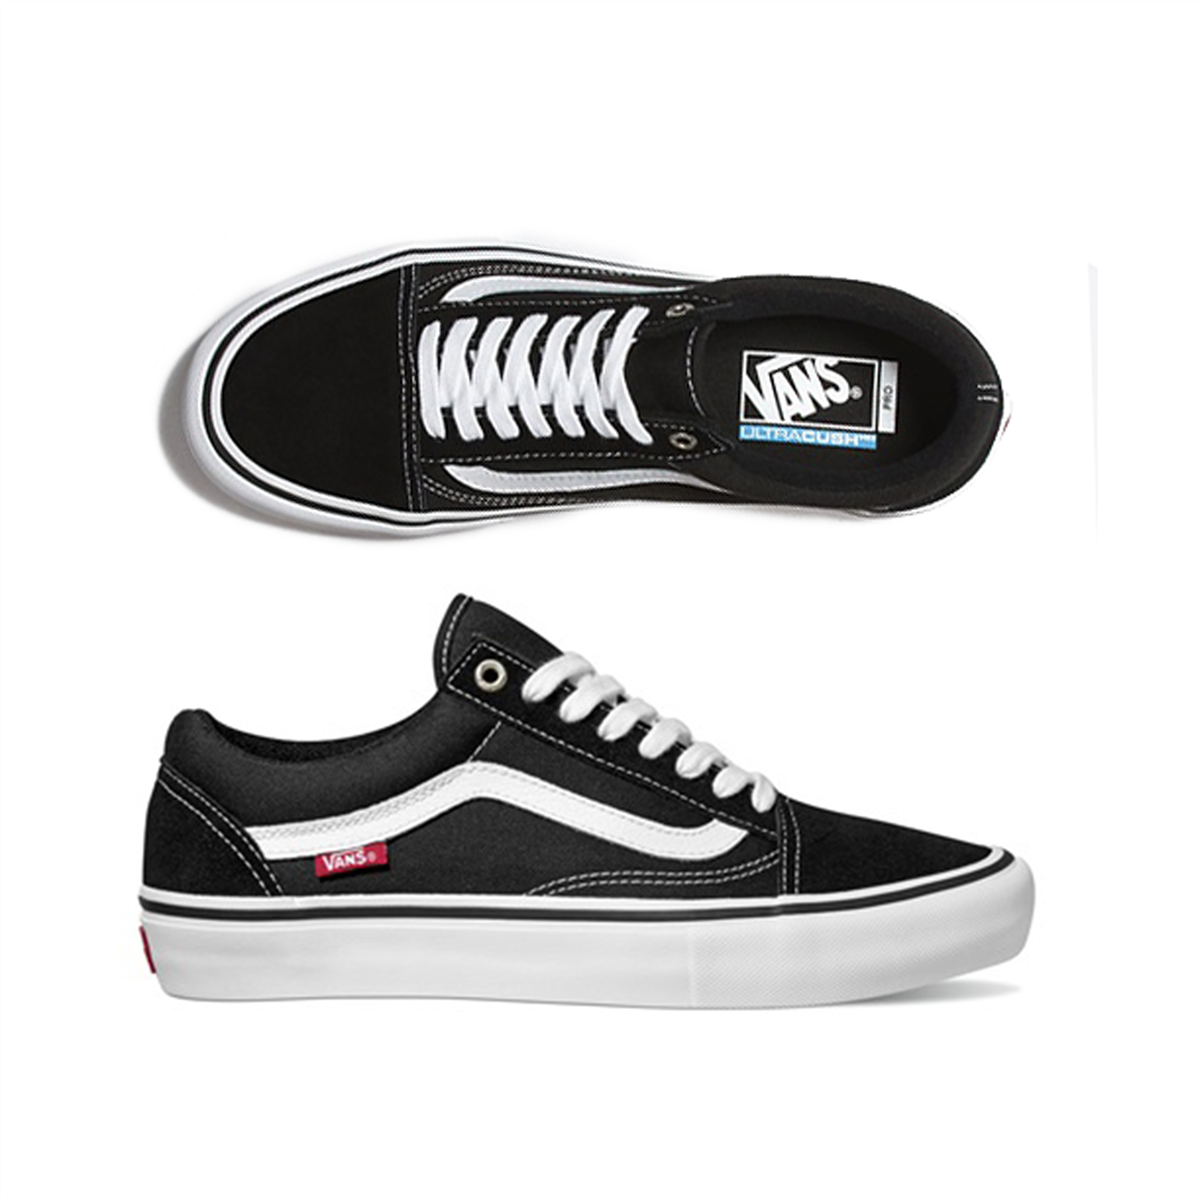 Vans Old Skool Pro Shoes Black White